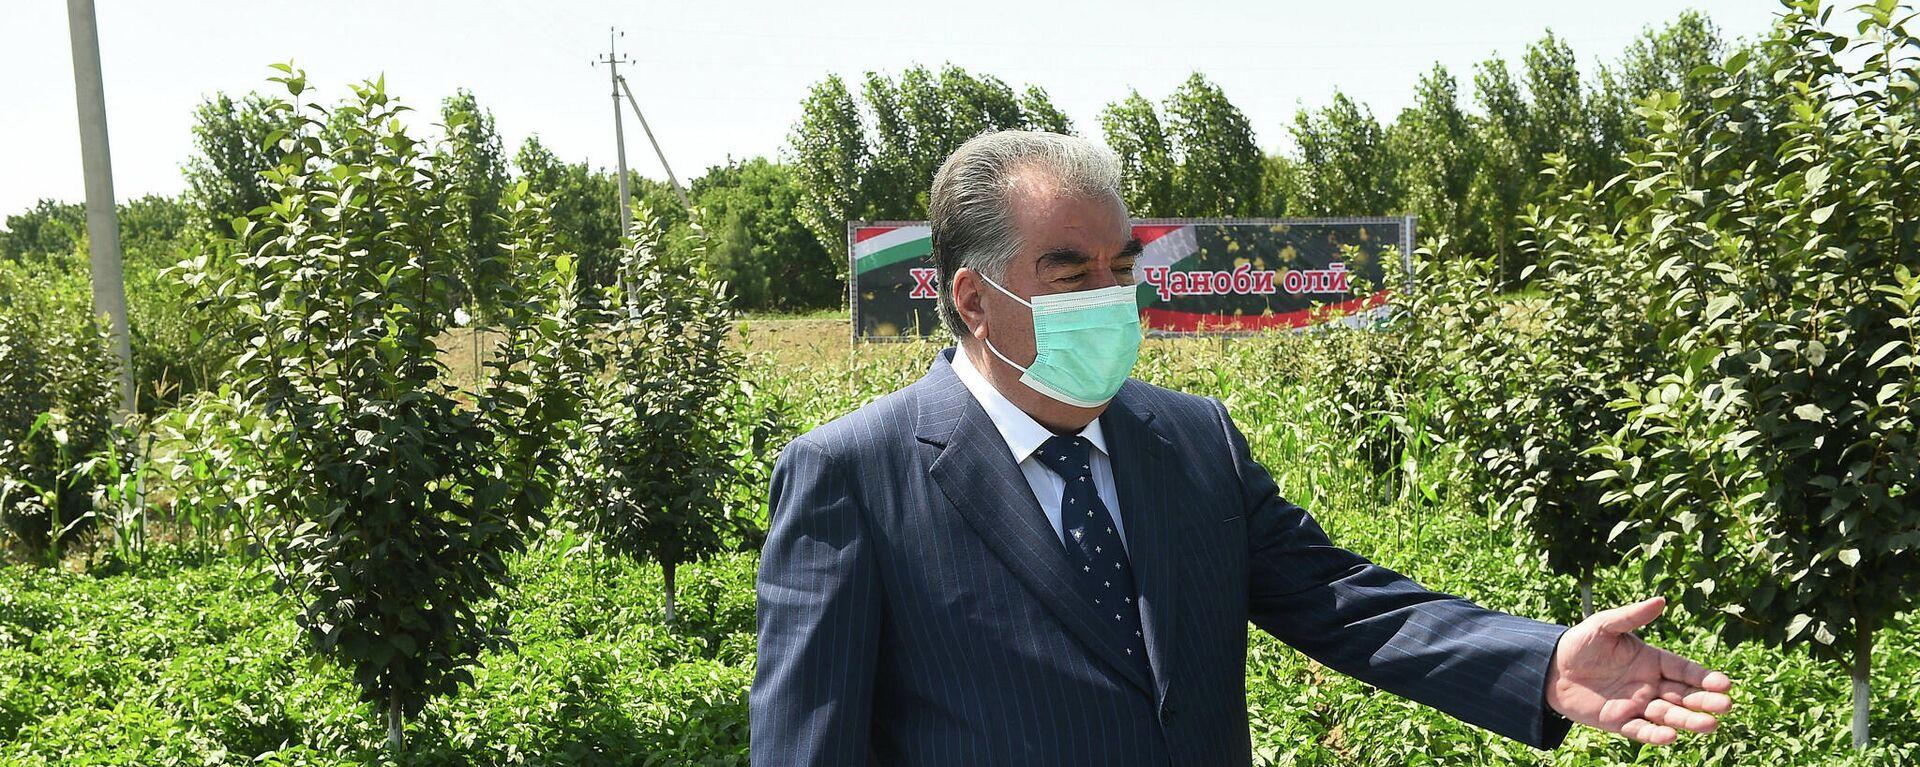 Визит президента Таджикистана Эмомали Рахмона в Согдийскую область - Sputnik Таджикистан, 1920, 24.09.2021